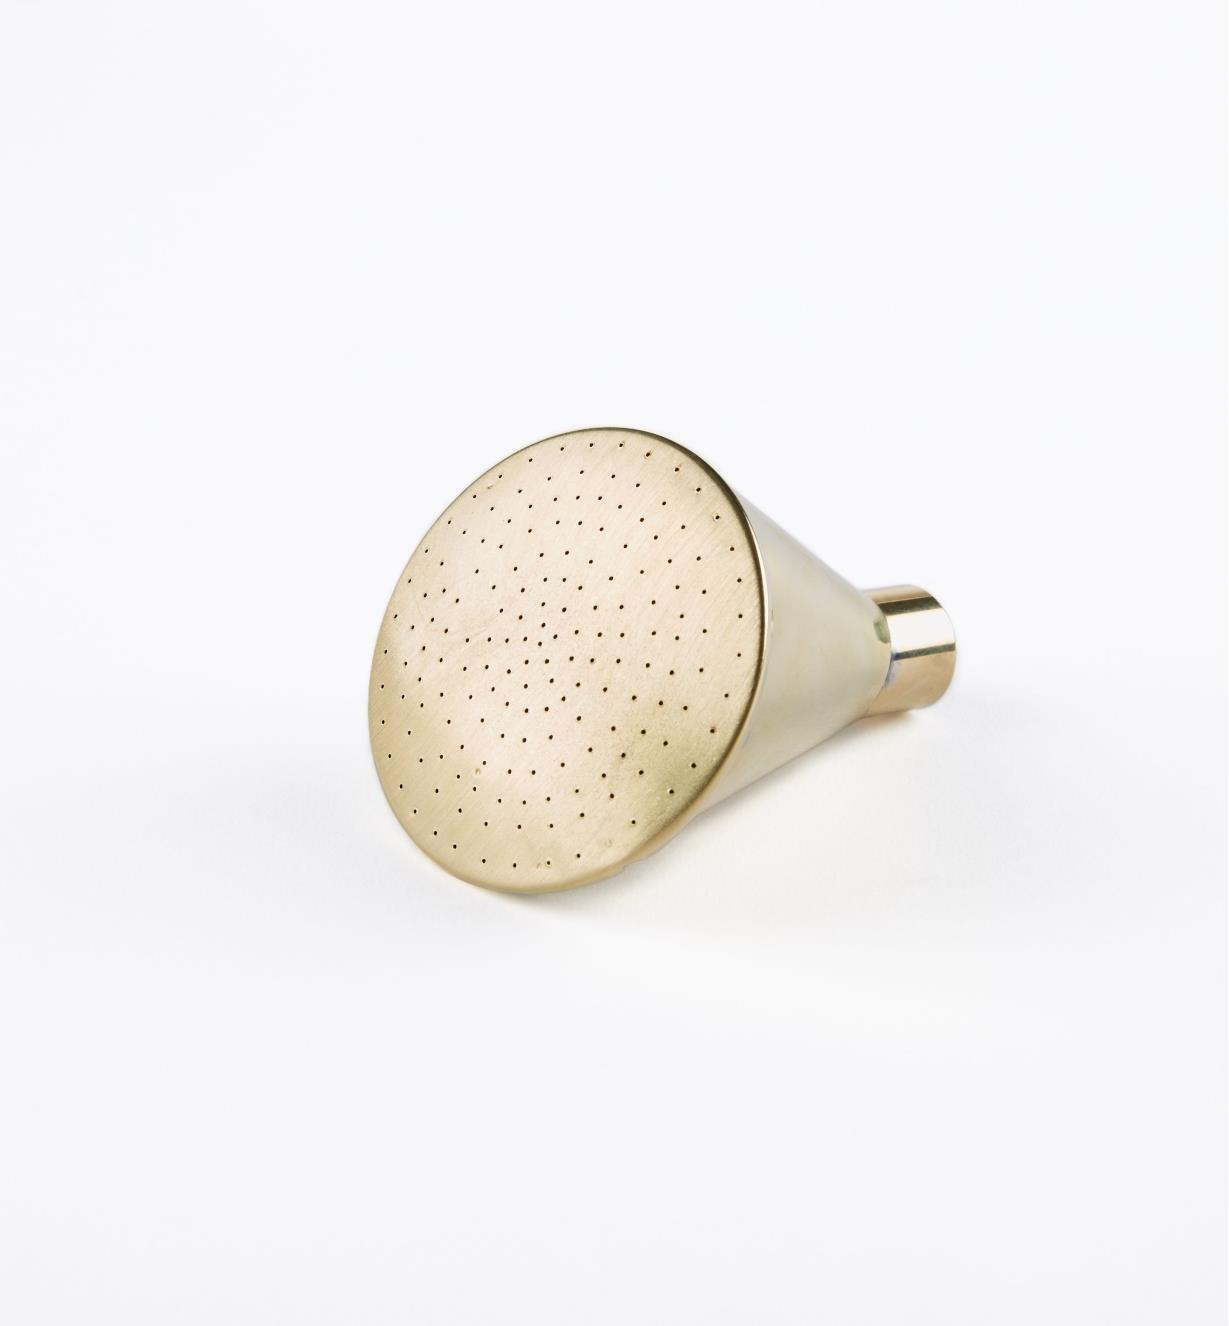 XB906 - Optional Round Brass Rose